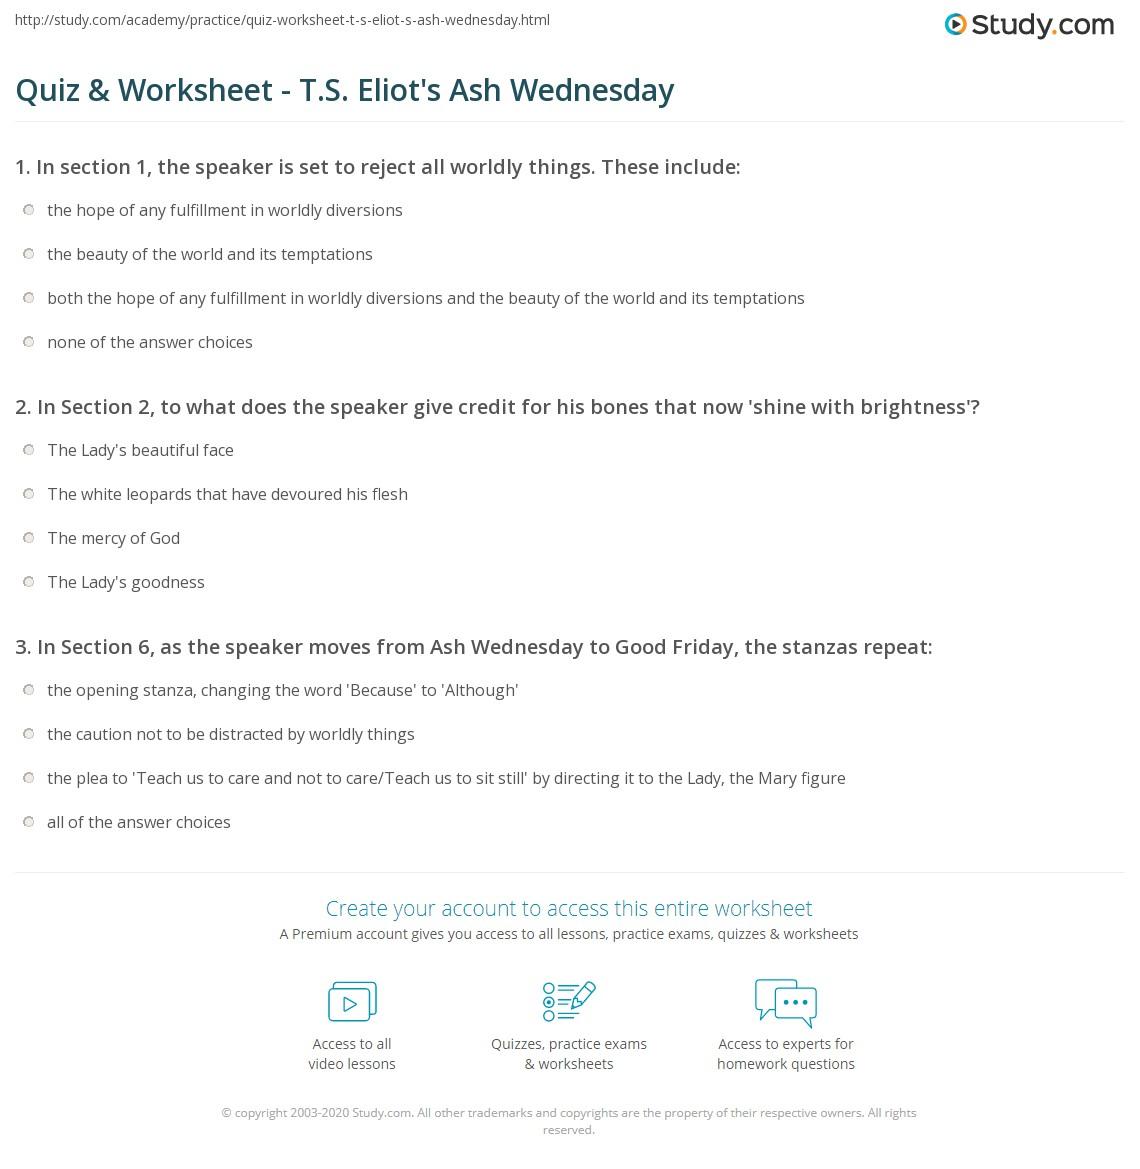 Quiz & Worksheet - T.S. Eliot\'s Ash Wednesday | Study.com